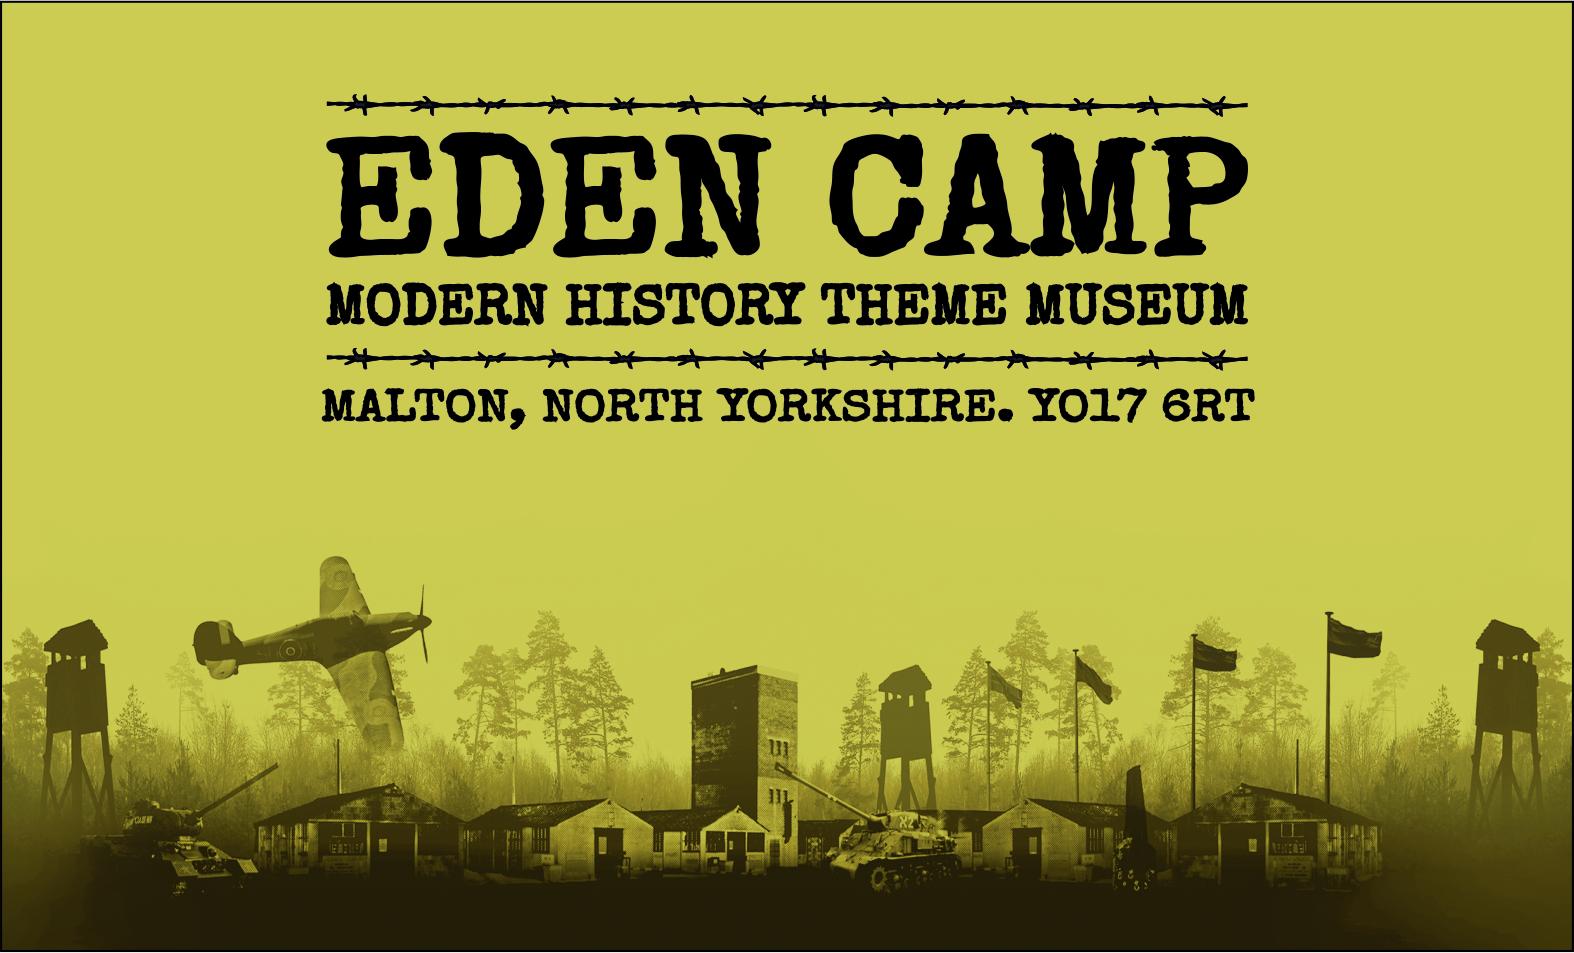 Eden Camp Modern History Theme Museum, Malton